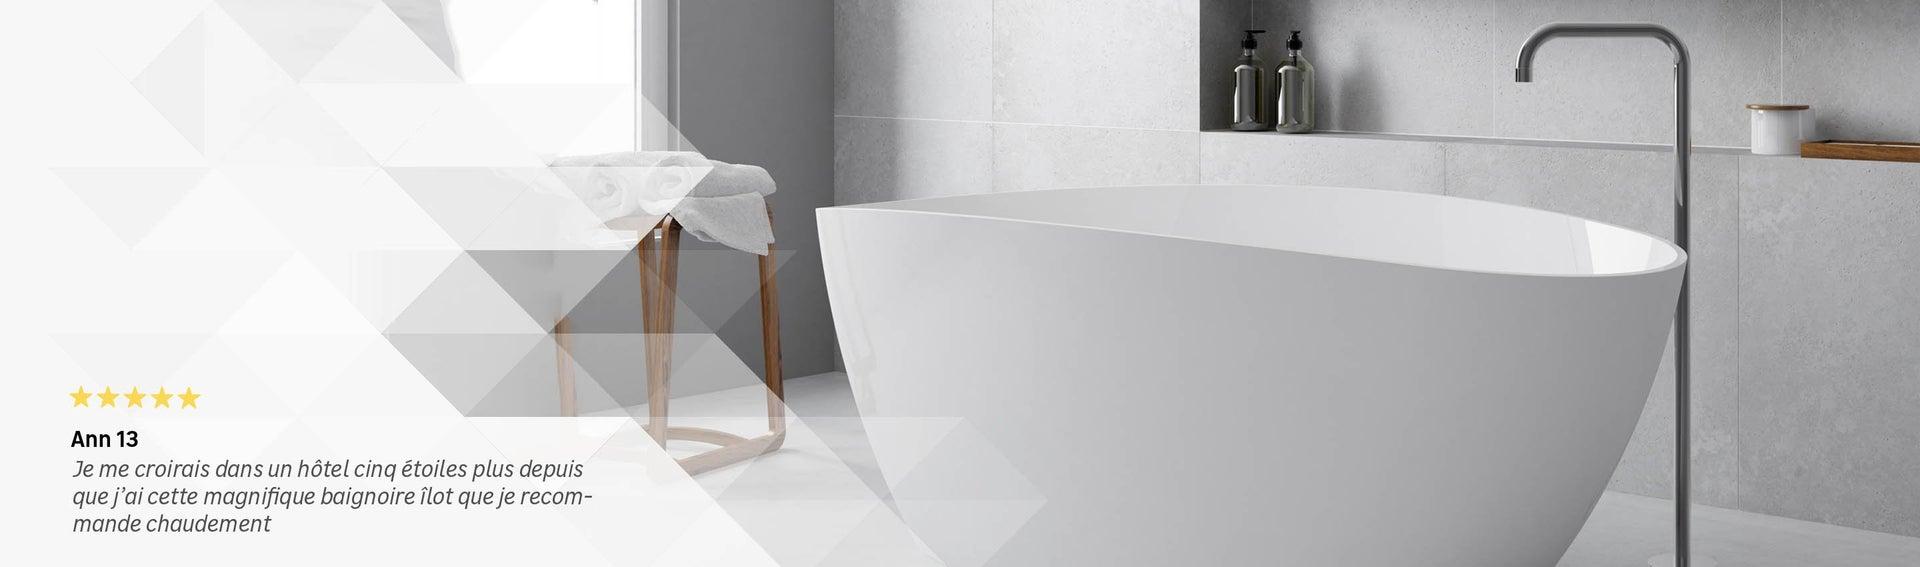 baignoire salle de bain leroy merlin. Black Bedroom Furniture Sets. Home Design Ideas